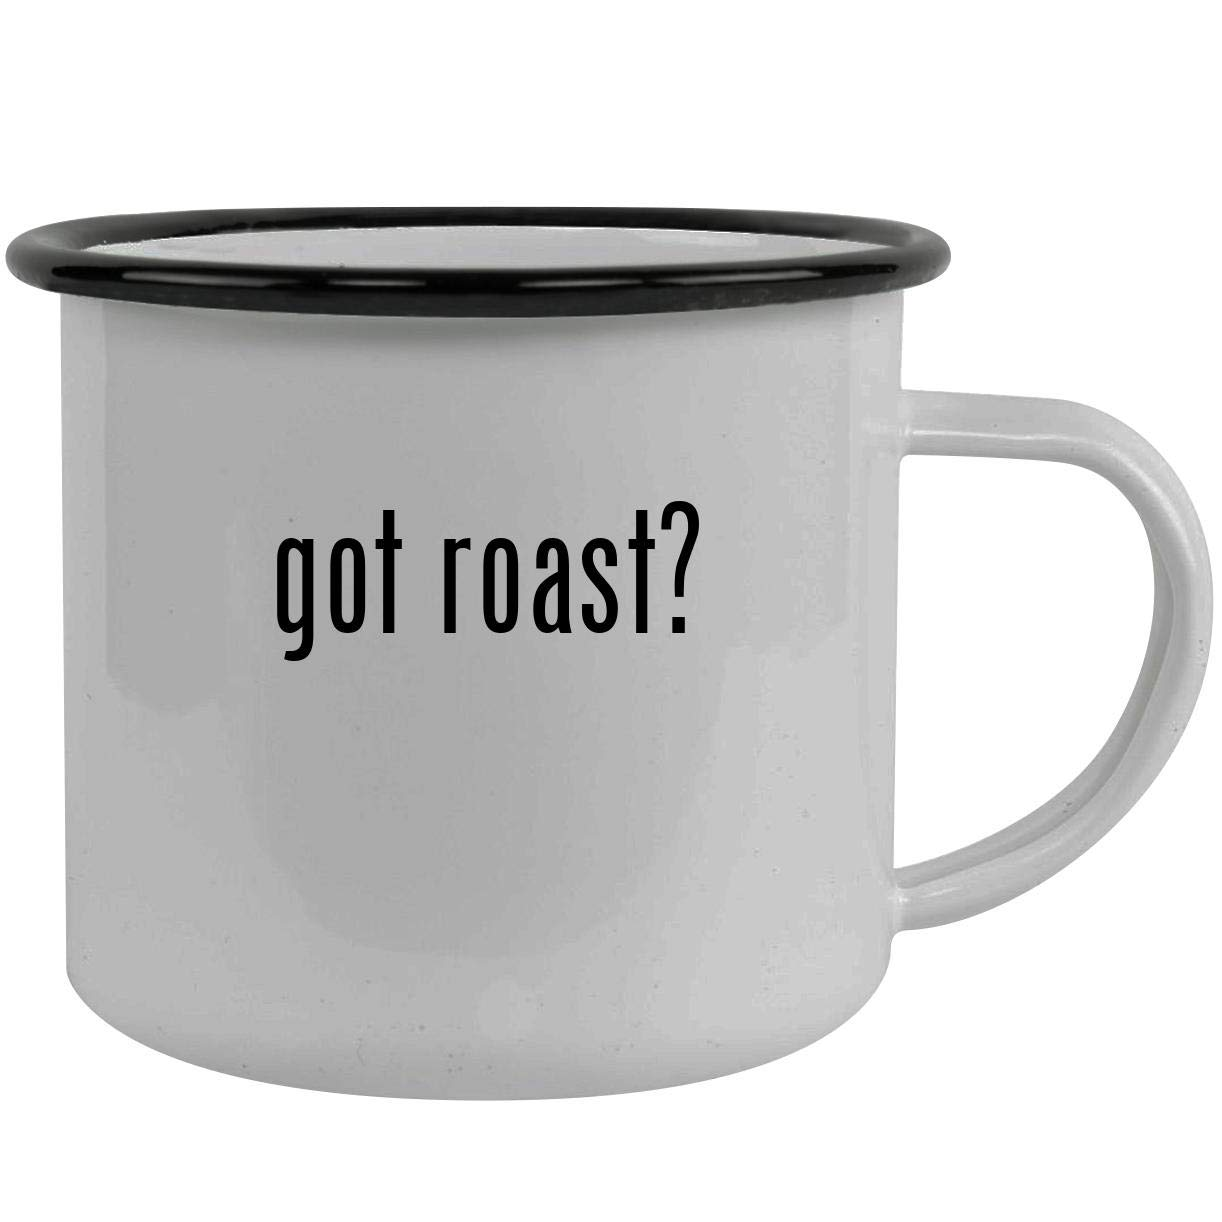 got roast? - Stainless Steel 12oz Camping Mug, Black